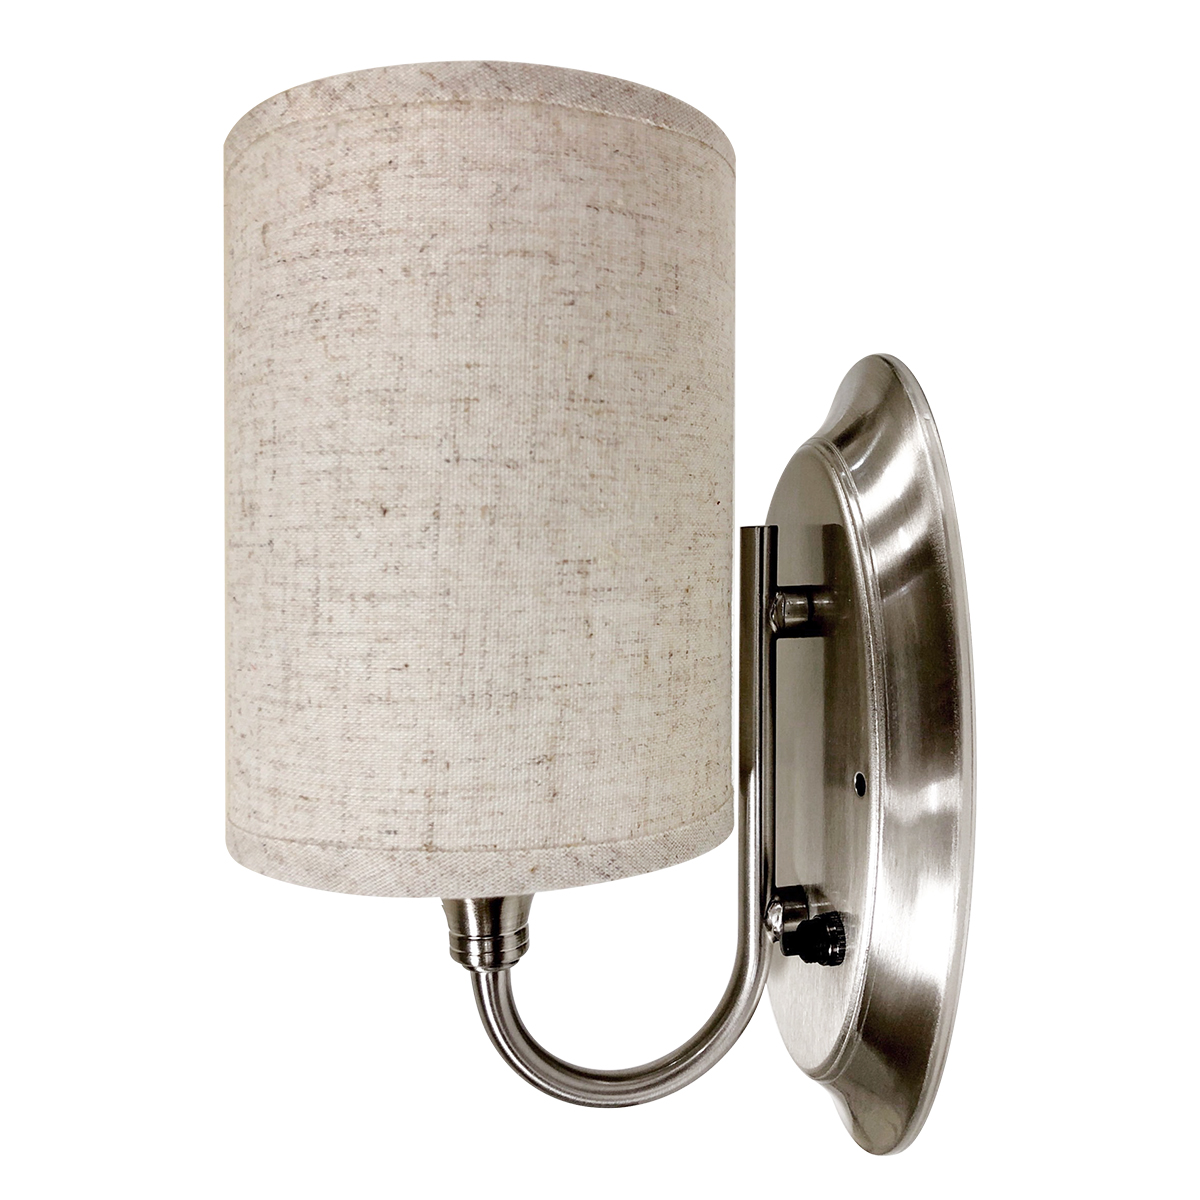 Dream Lighting RV LED Decorative Wall Sconce Light Caravan ... on Led Interior Wall Sconces id=66239